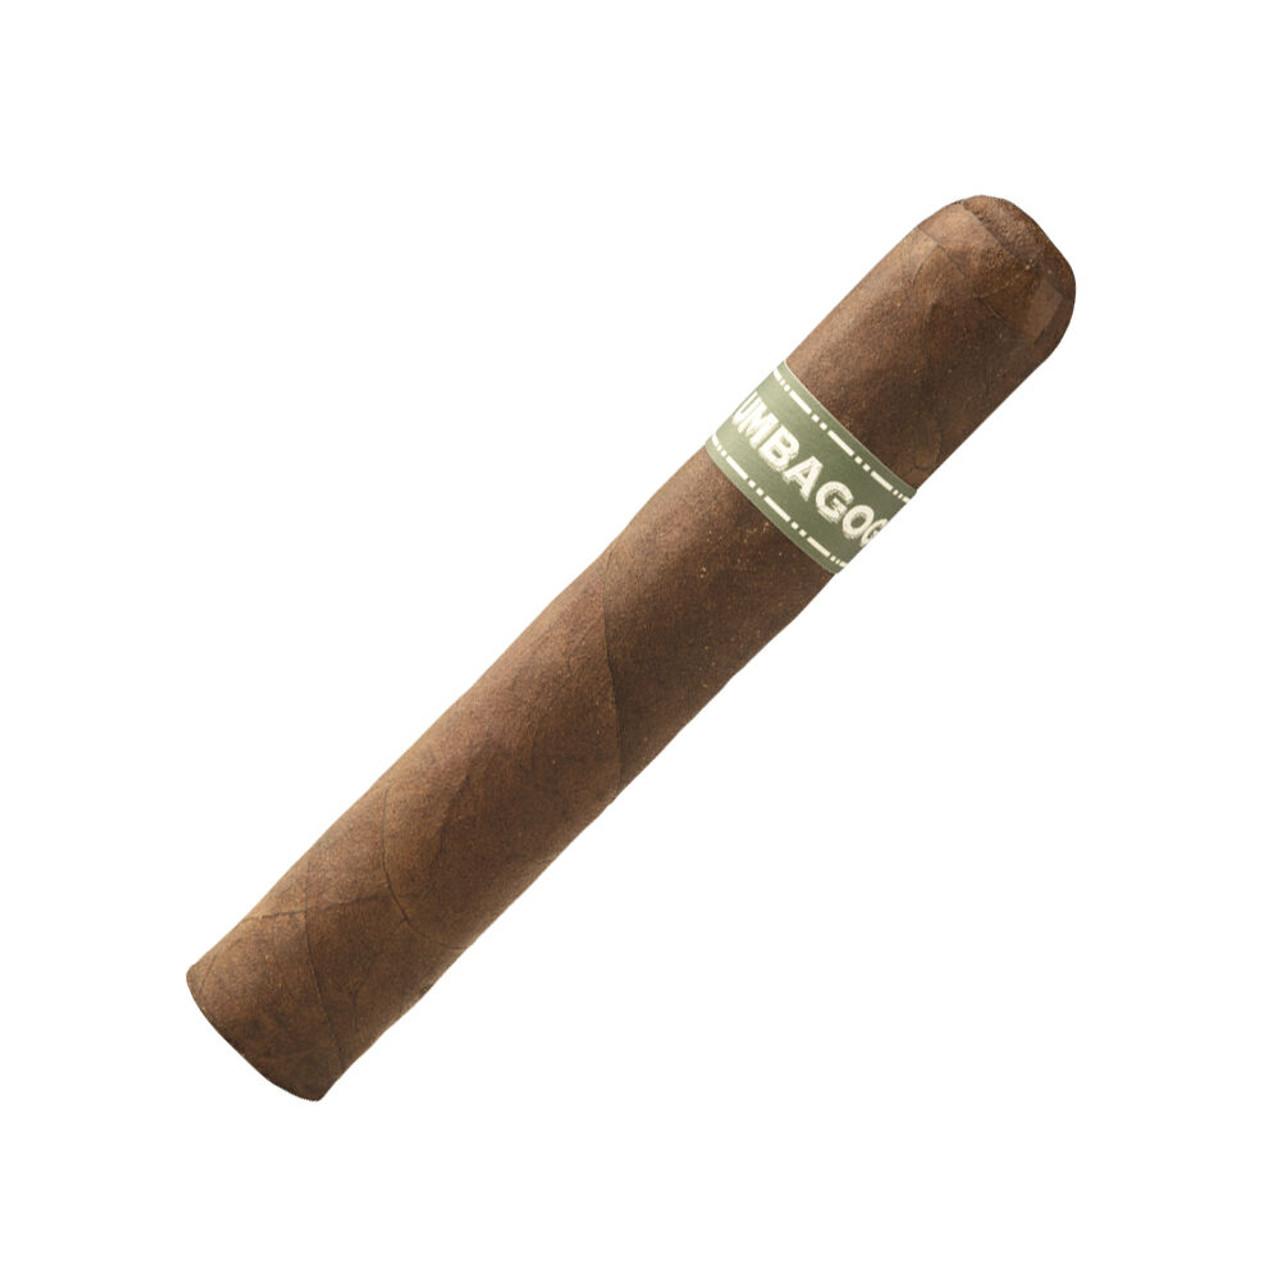 Umbagog Robusto Plus Cigars - 5 x 52 (Bundle of 10)